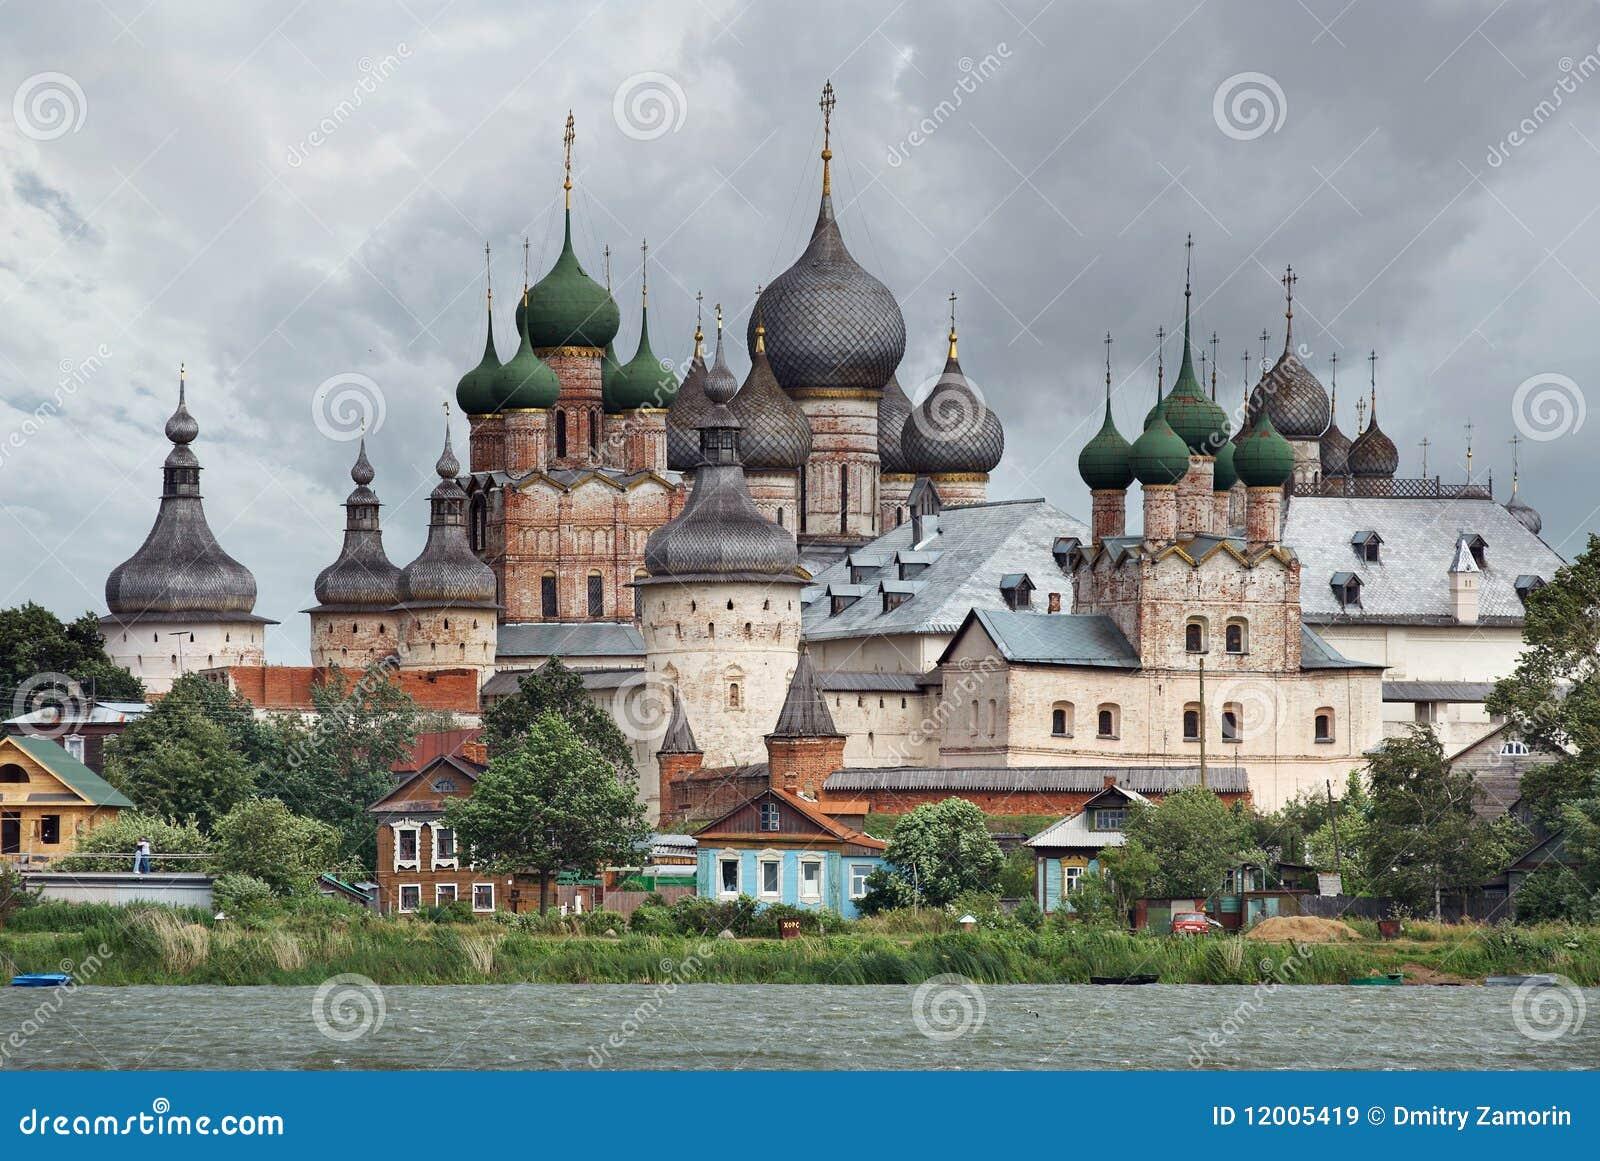 Russia Town Of Rostov The Great Rostov Kremlin Royalty